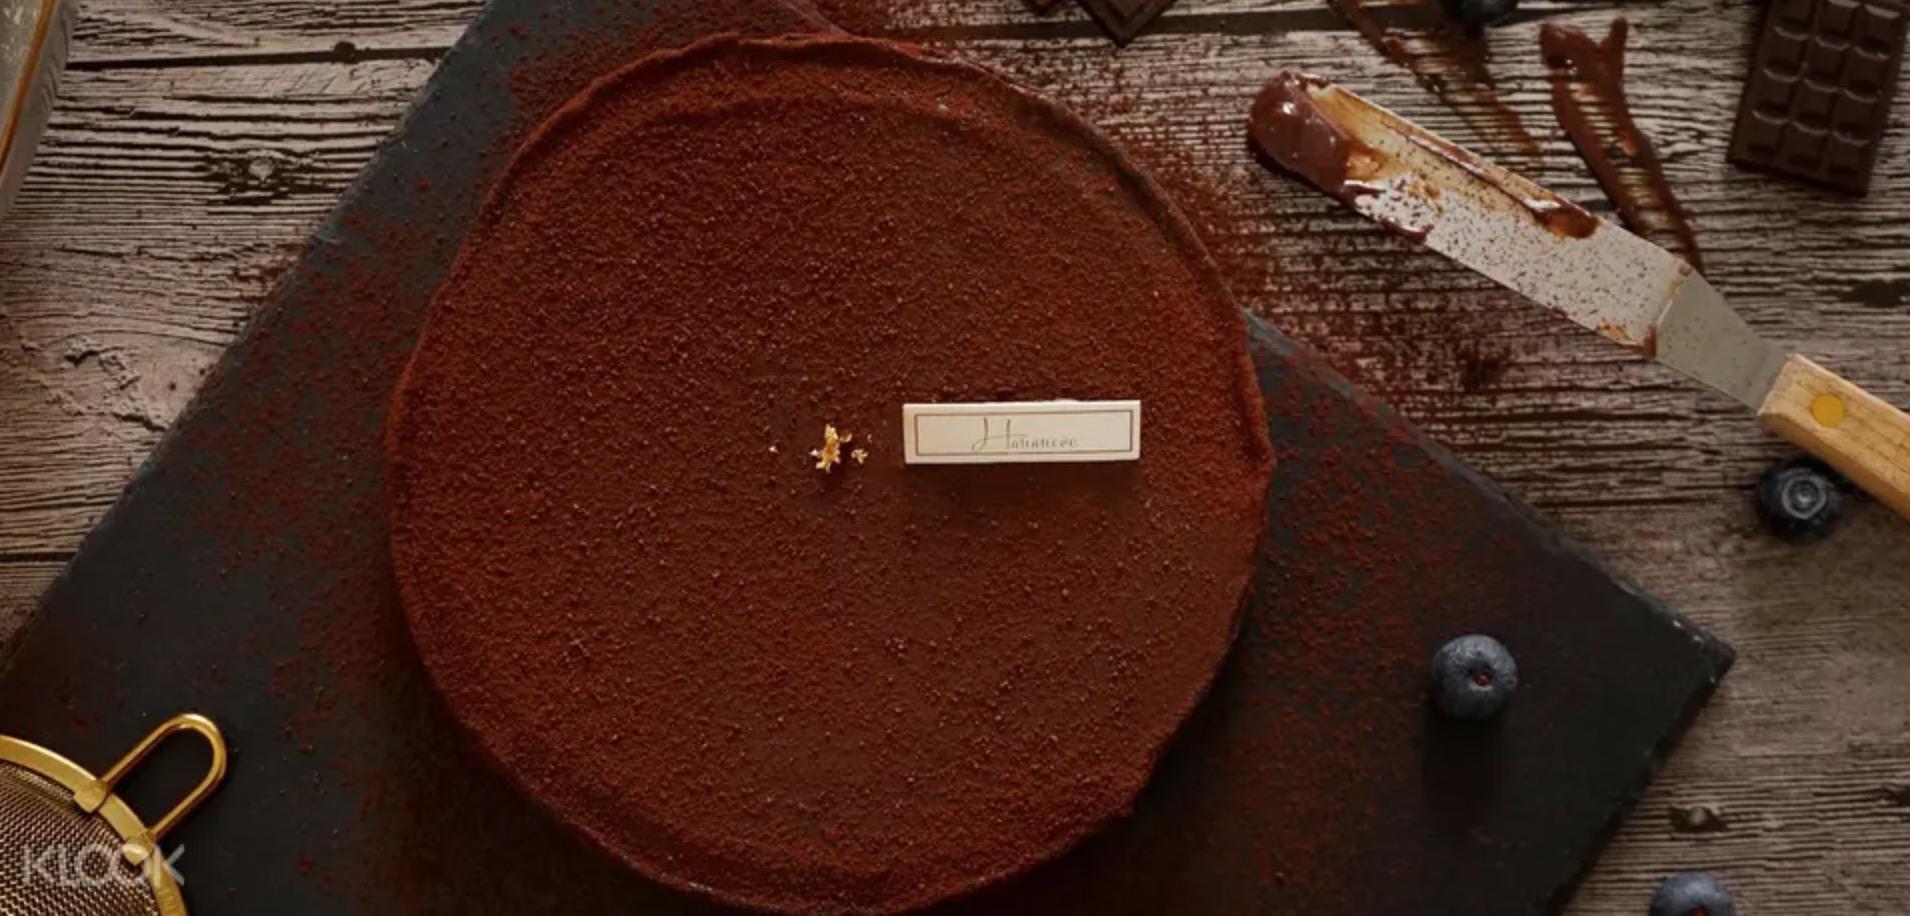 Hacaneco花貓蛋糕實驗室 - 自己做蛋糕